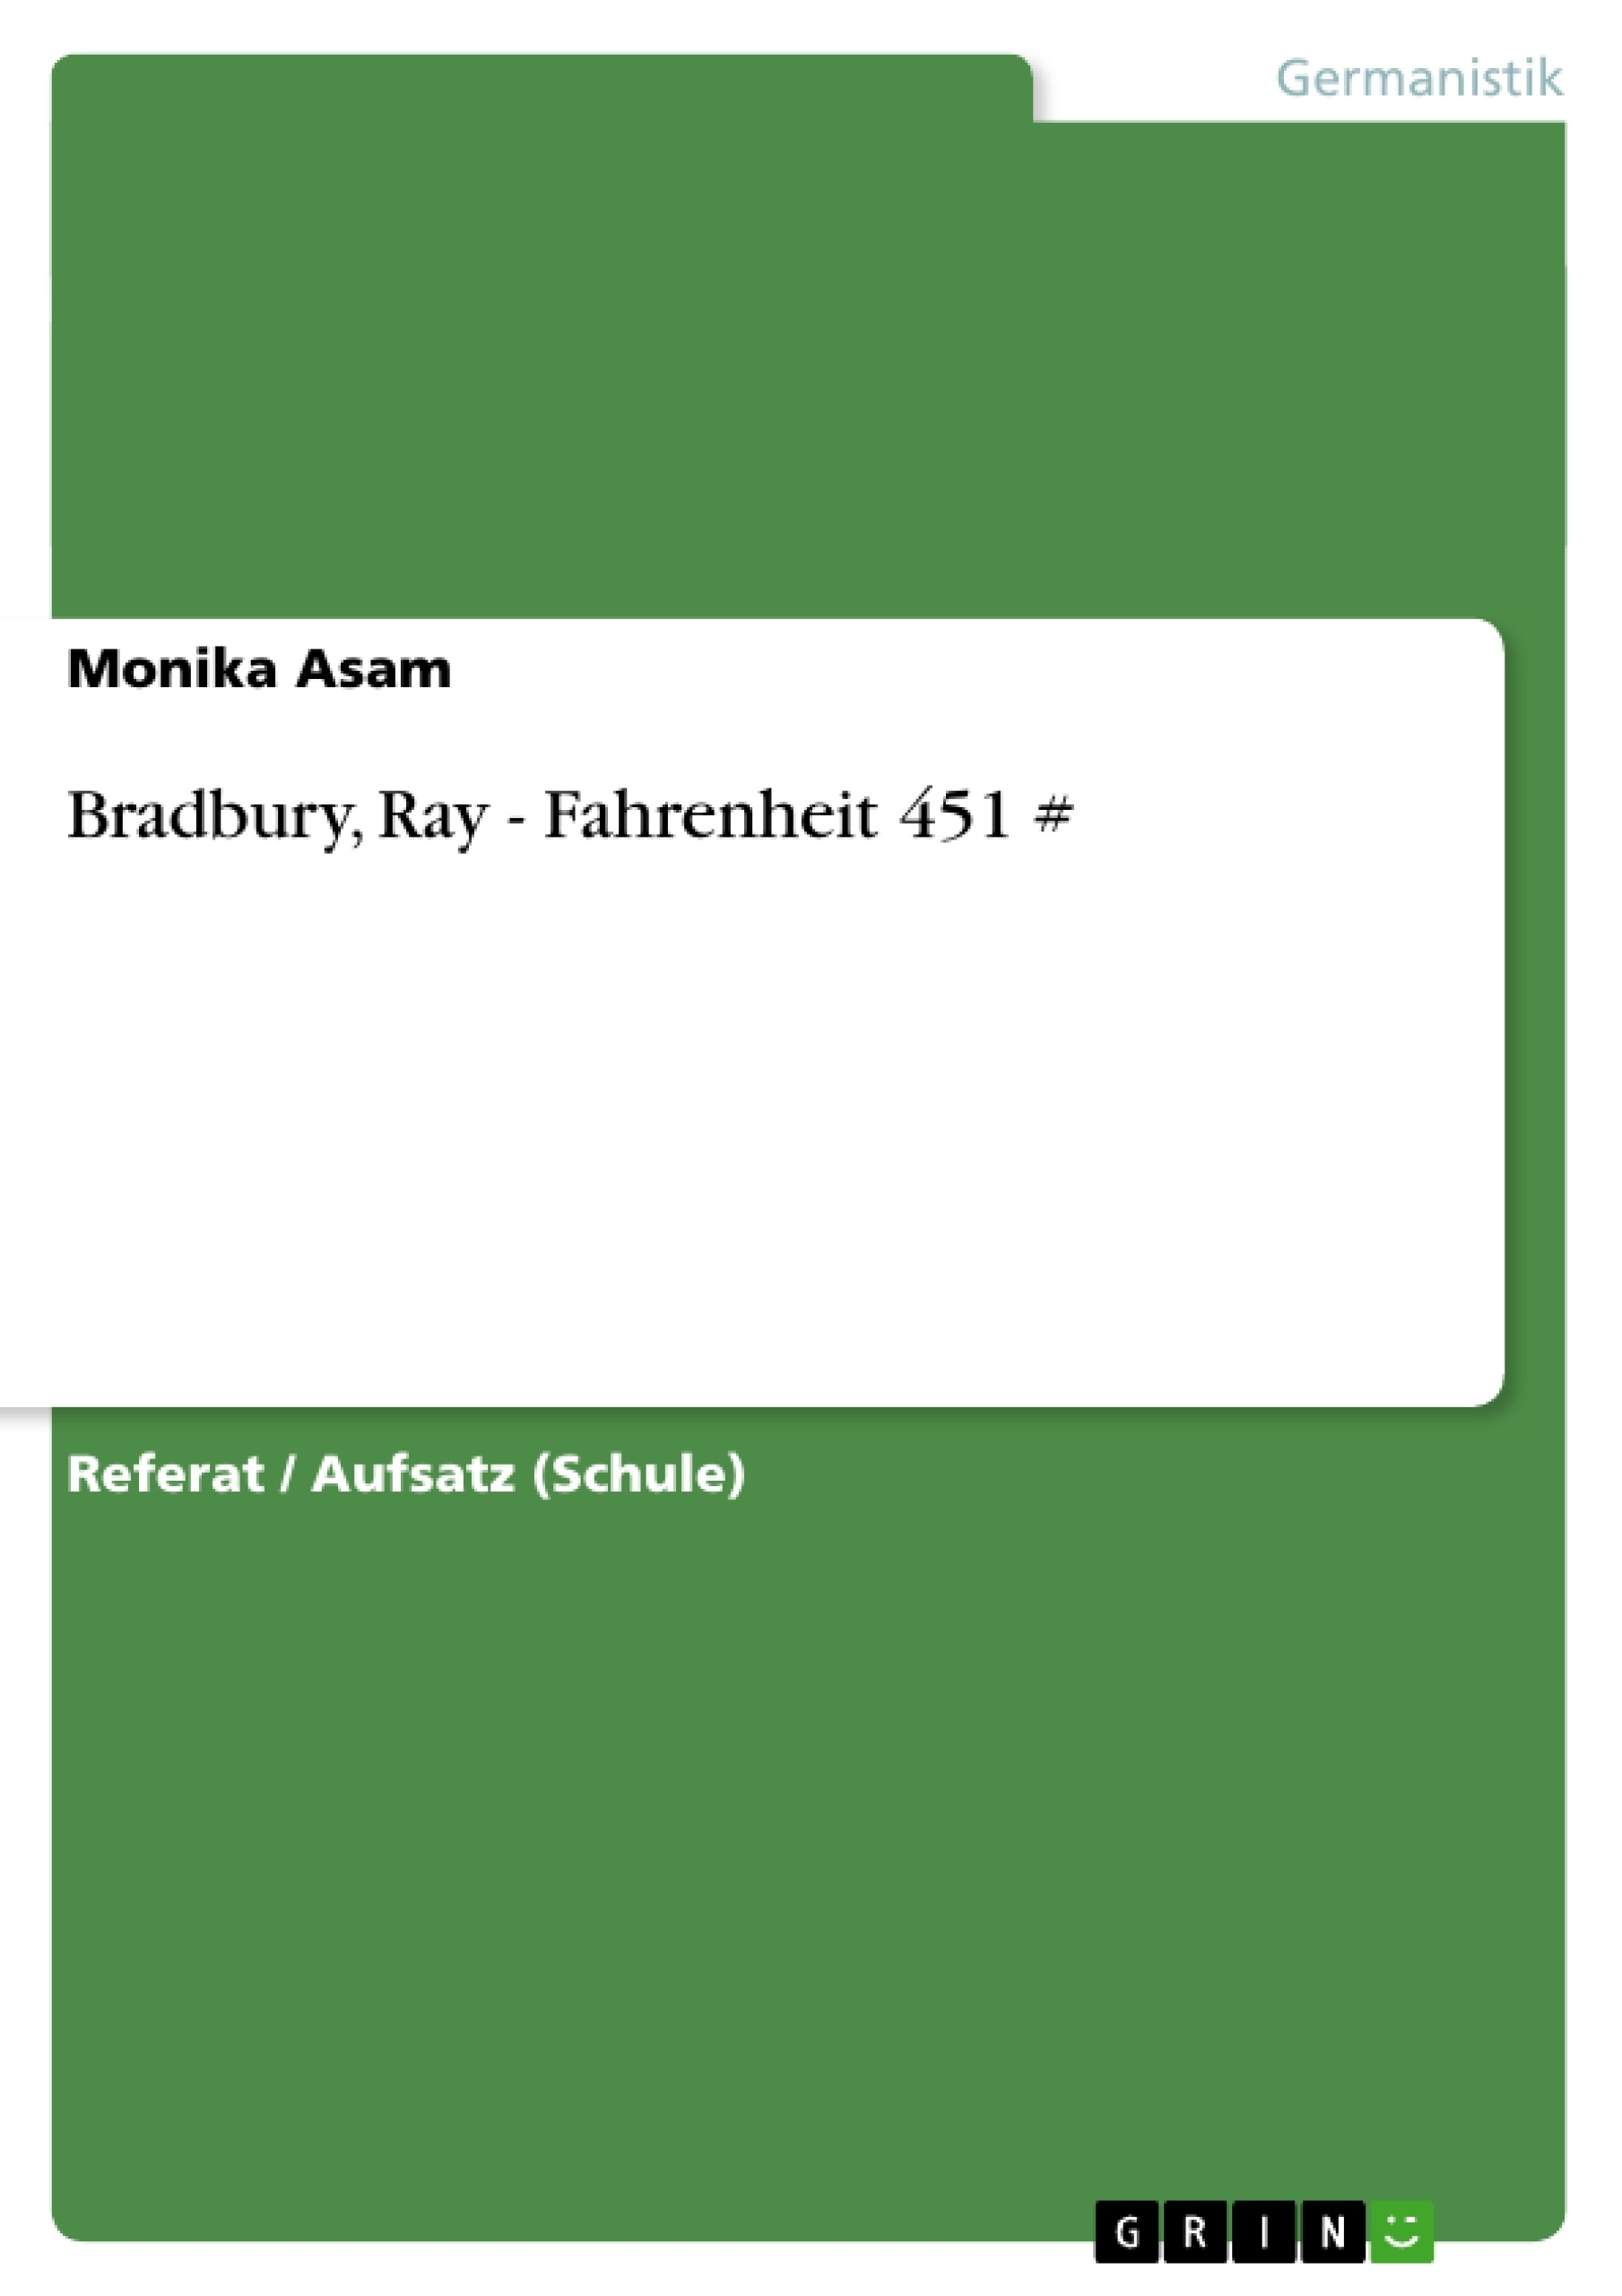 Titel: Bradbury, Ray - Fahrenheit 451 #